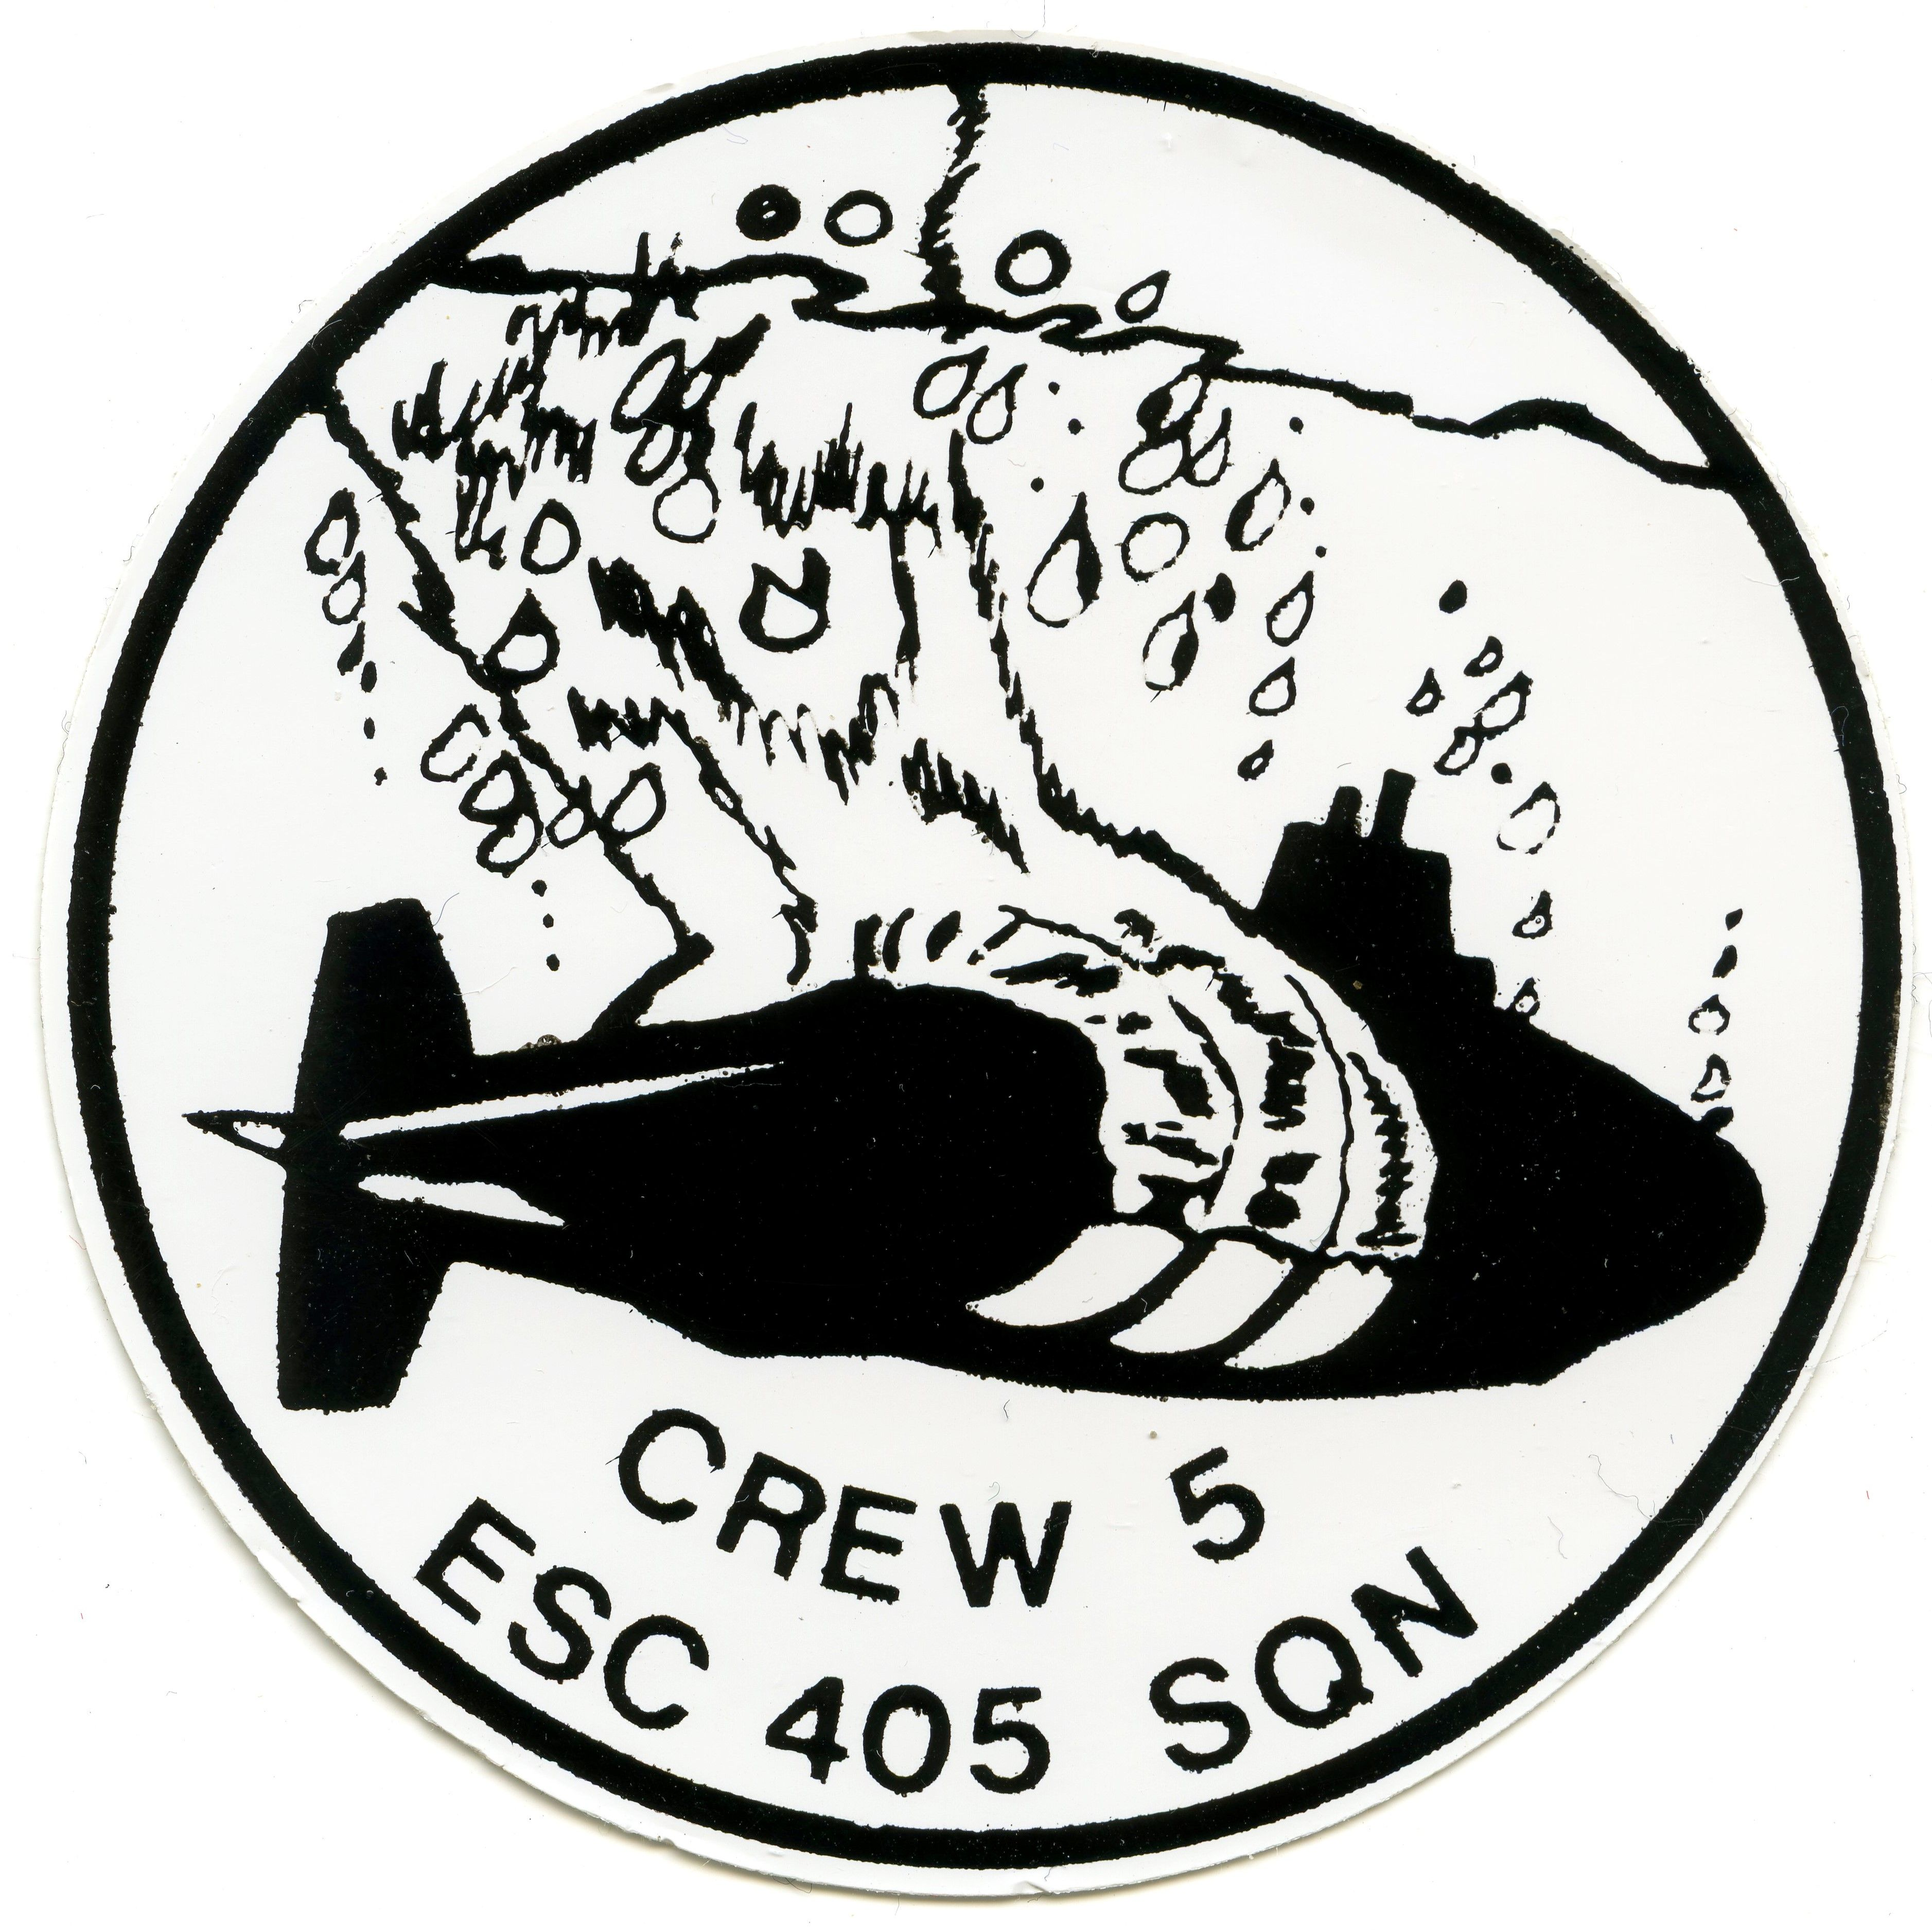 RCAF 405 Squadron (Crew 5) Sticker Stickers, Crew, Air